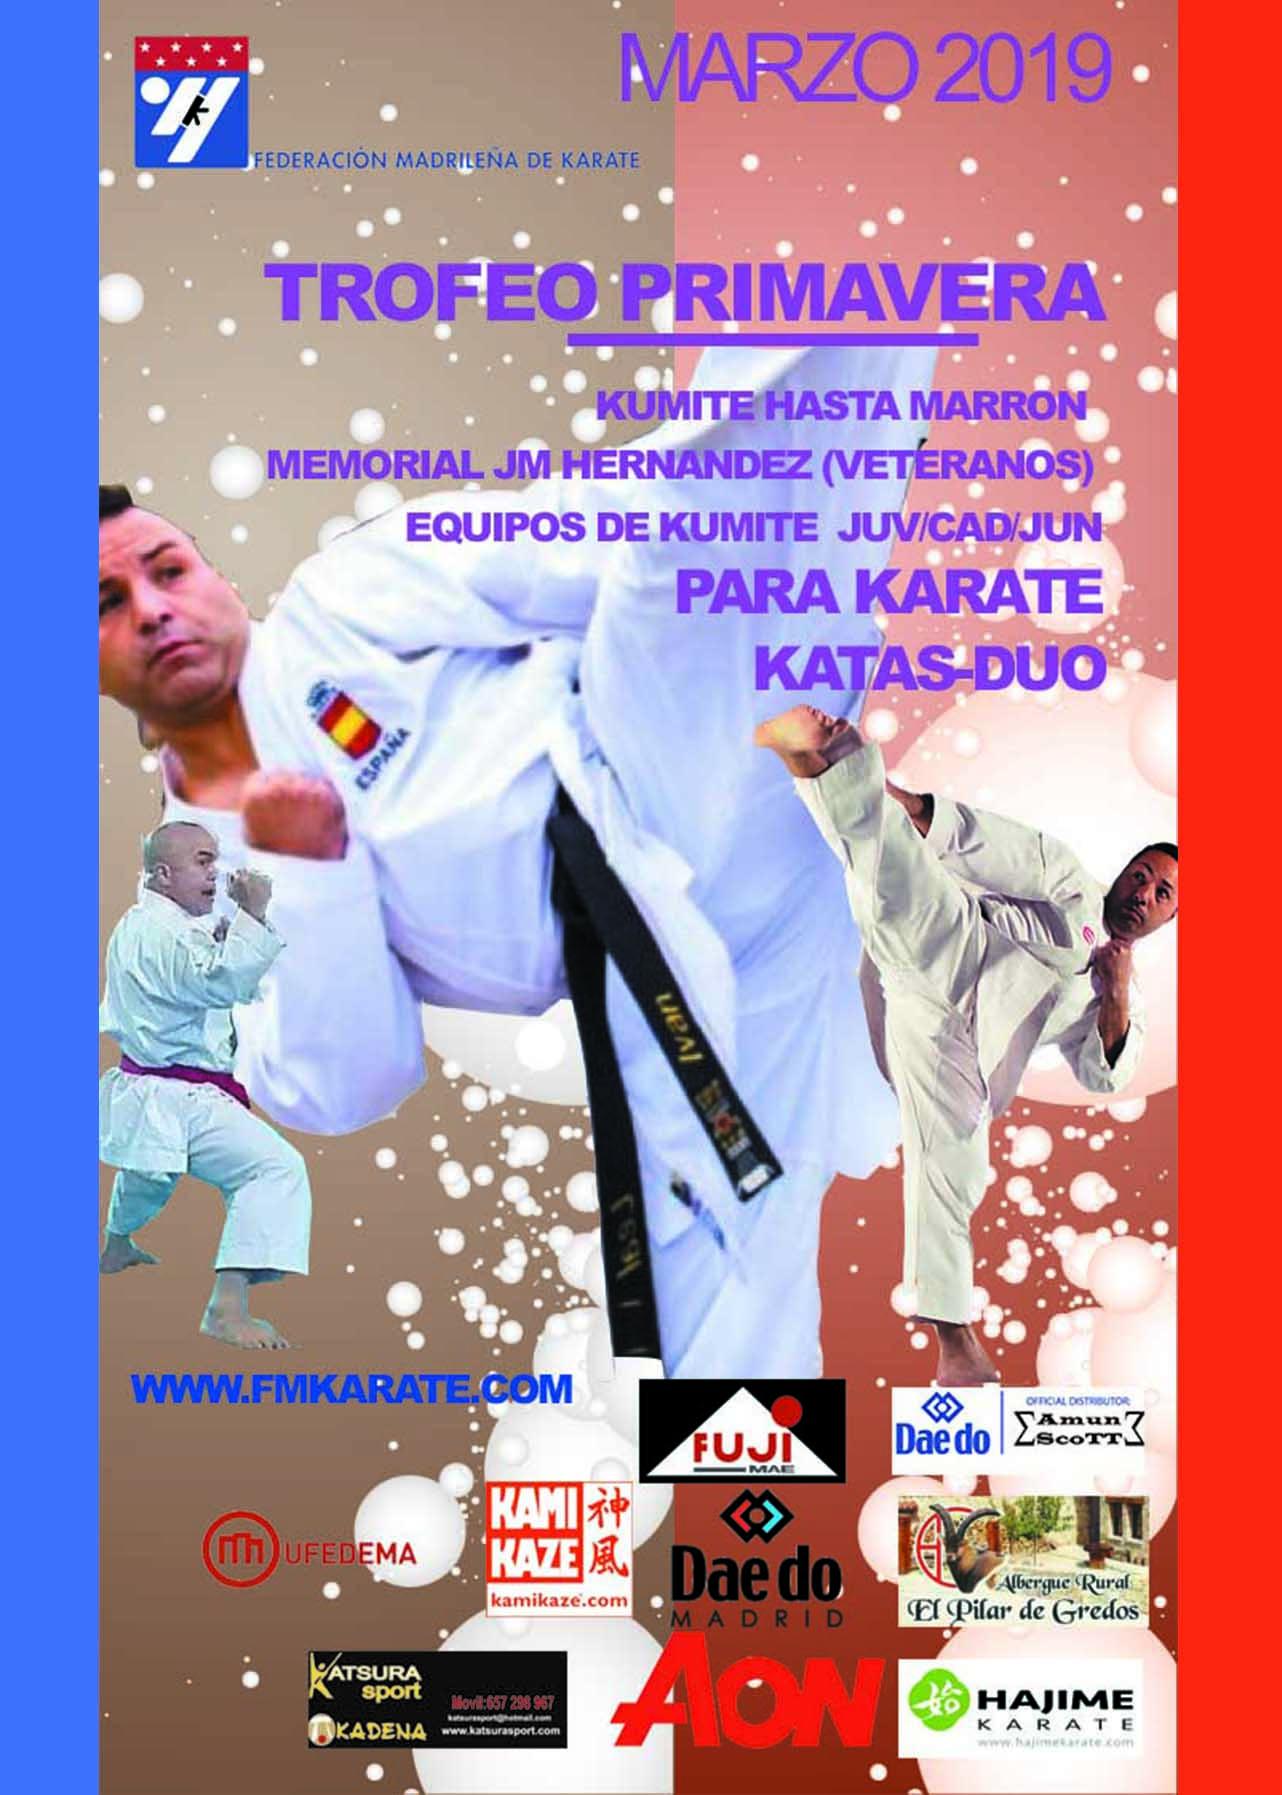 FMK Trofeo Primavera 2019